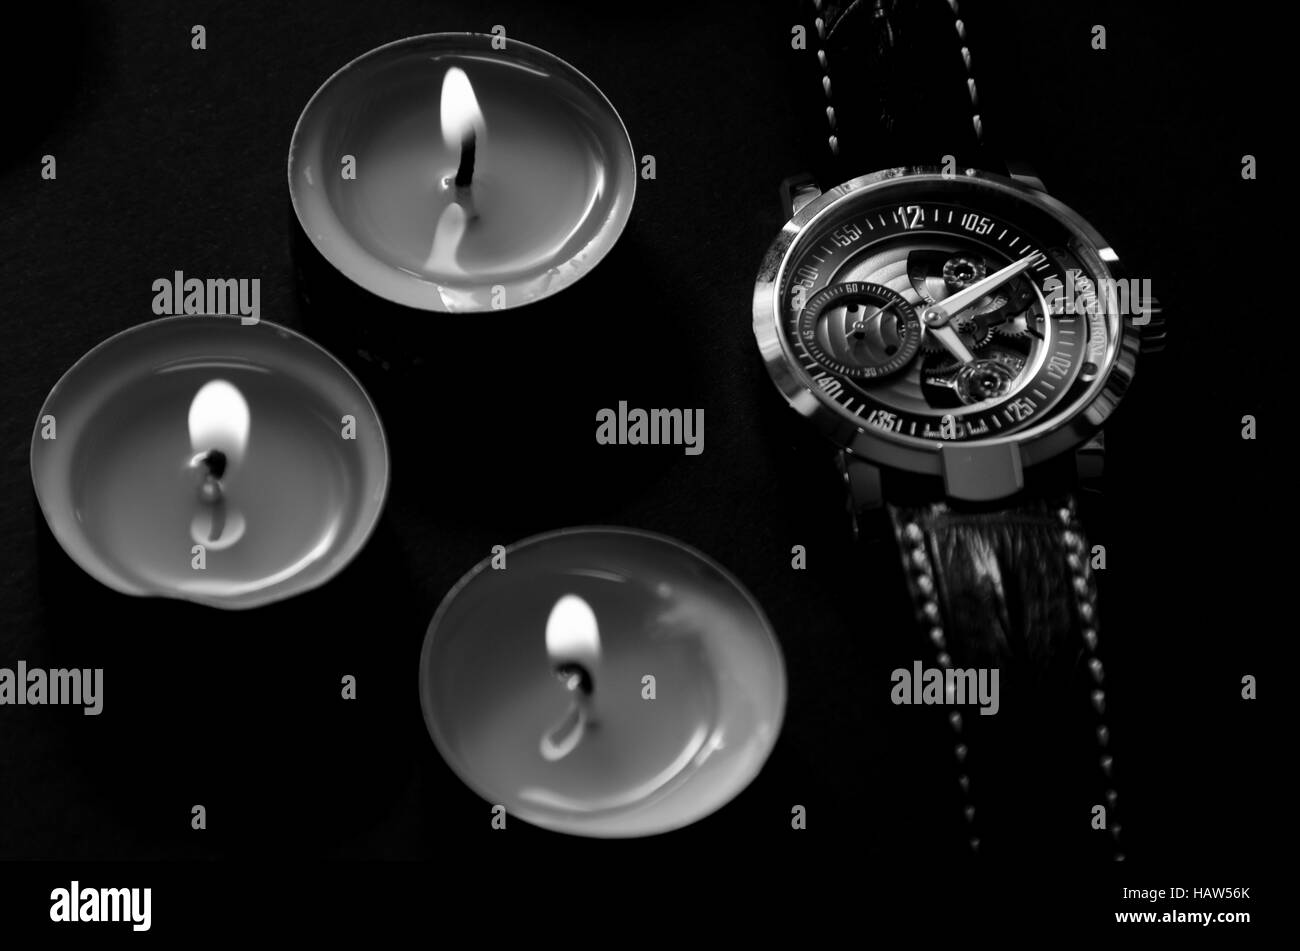 Armin Strom Designer Wrist Watch - Stock Image